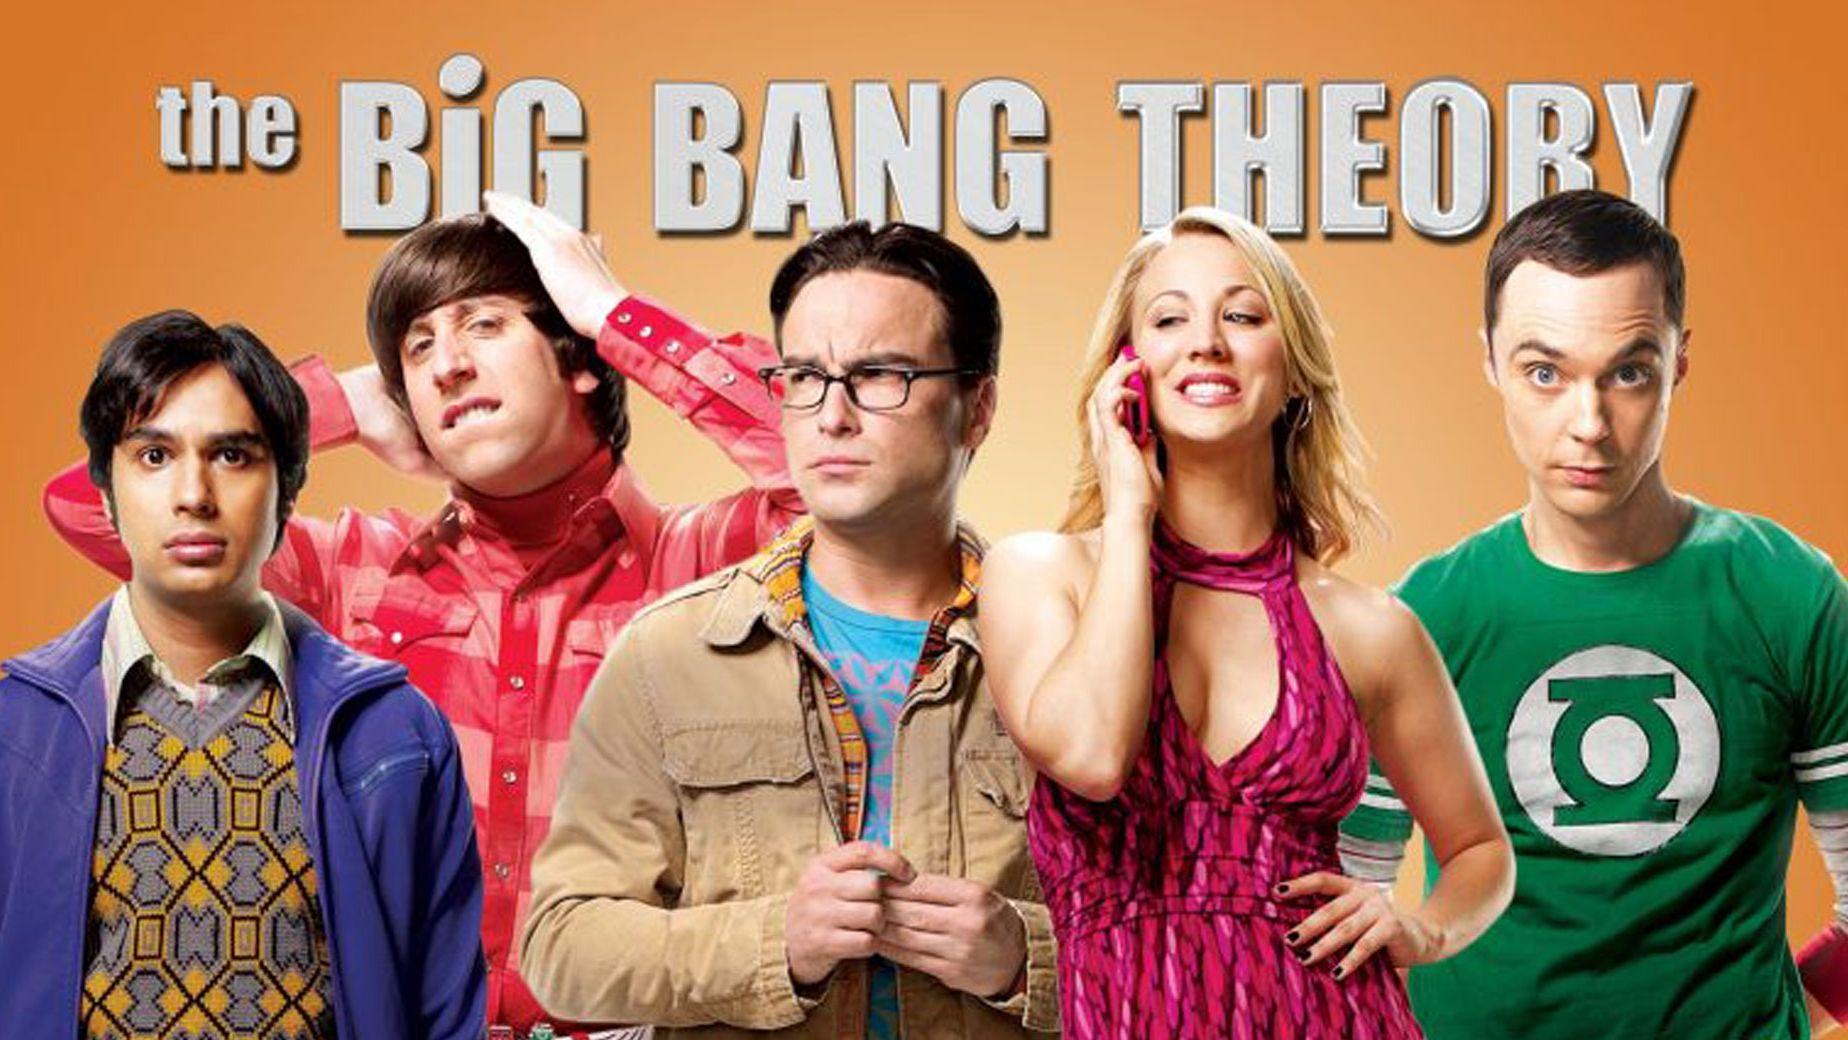 The Big Bang Theory e o DISC